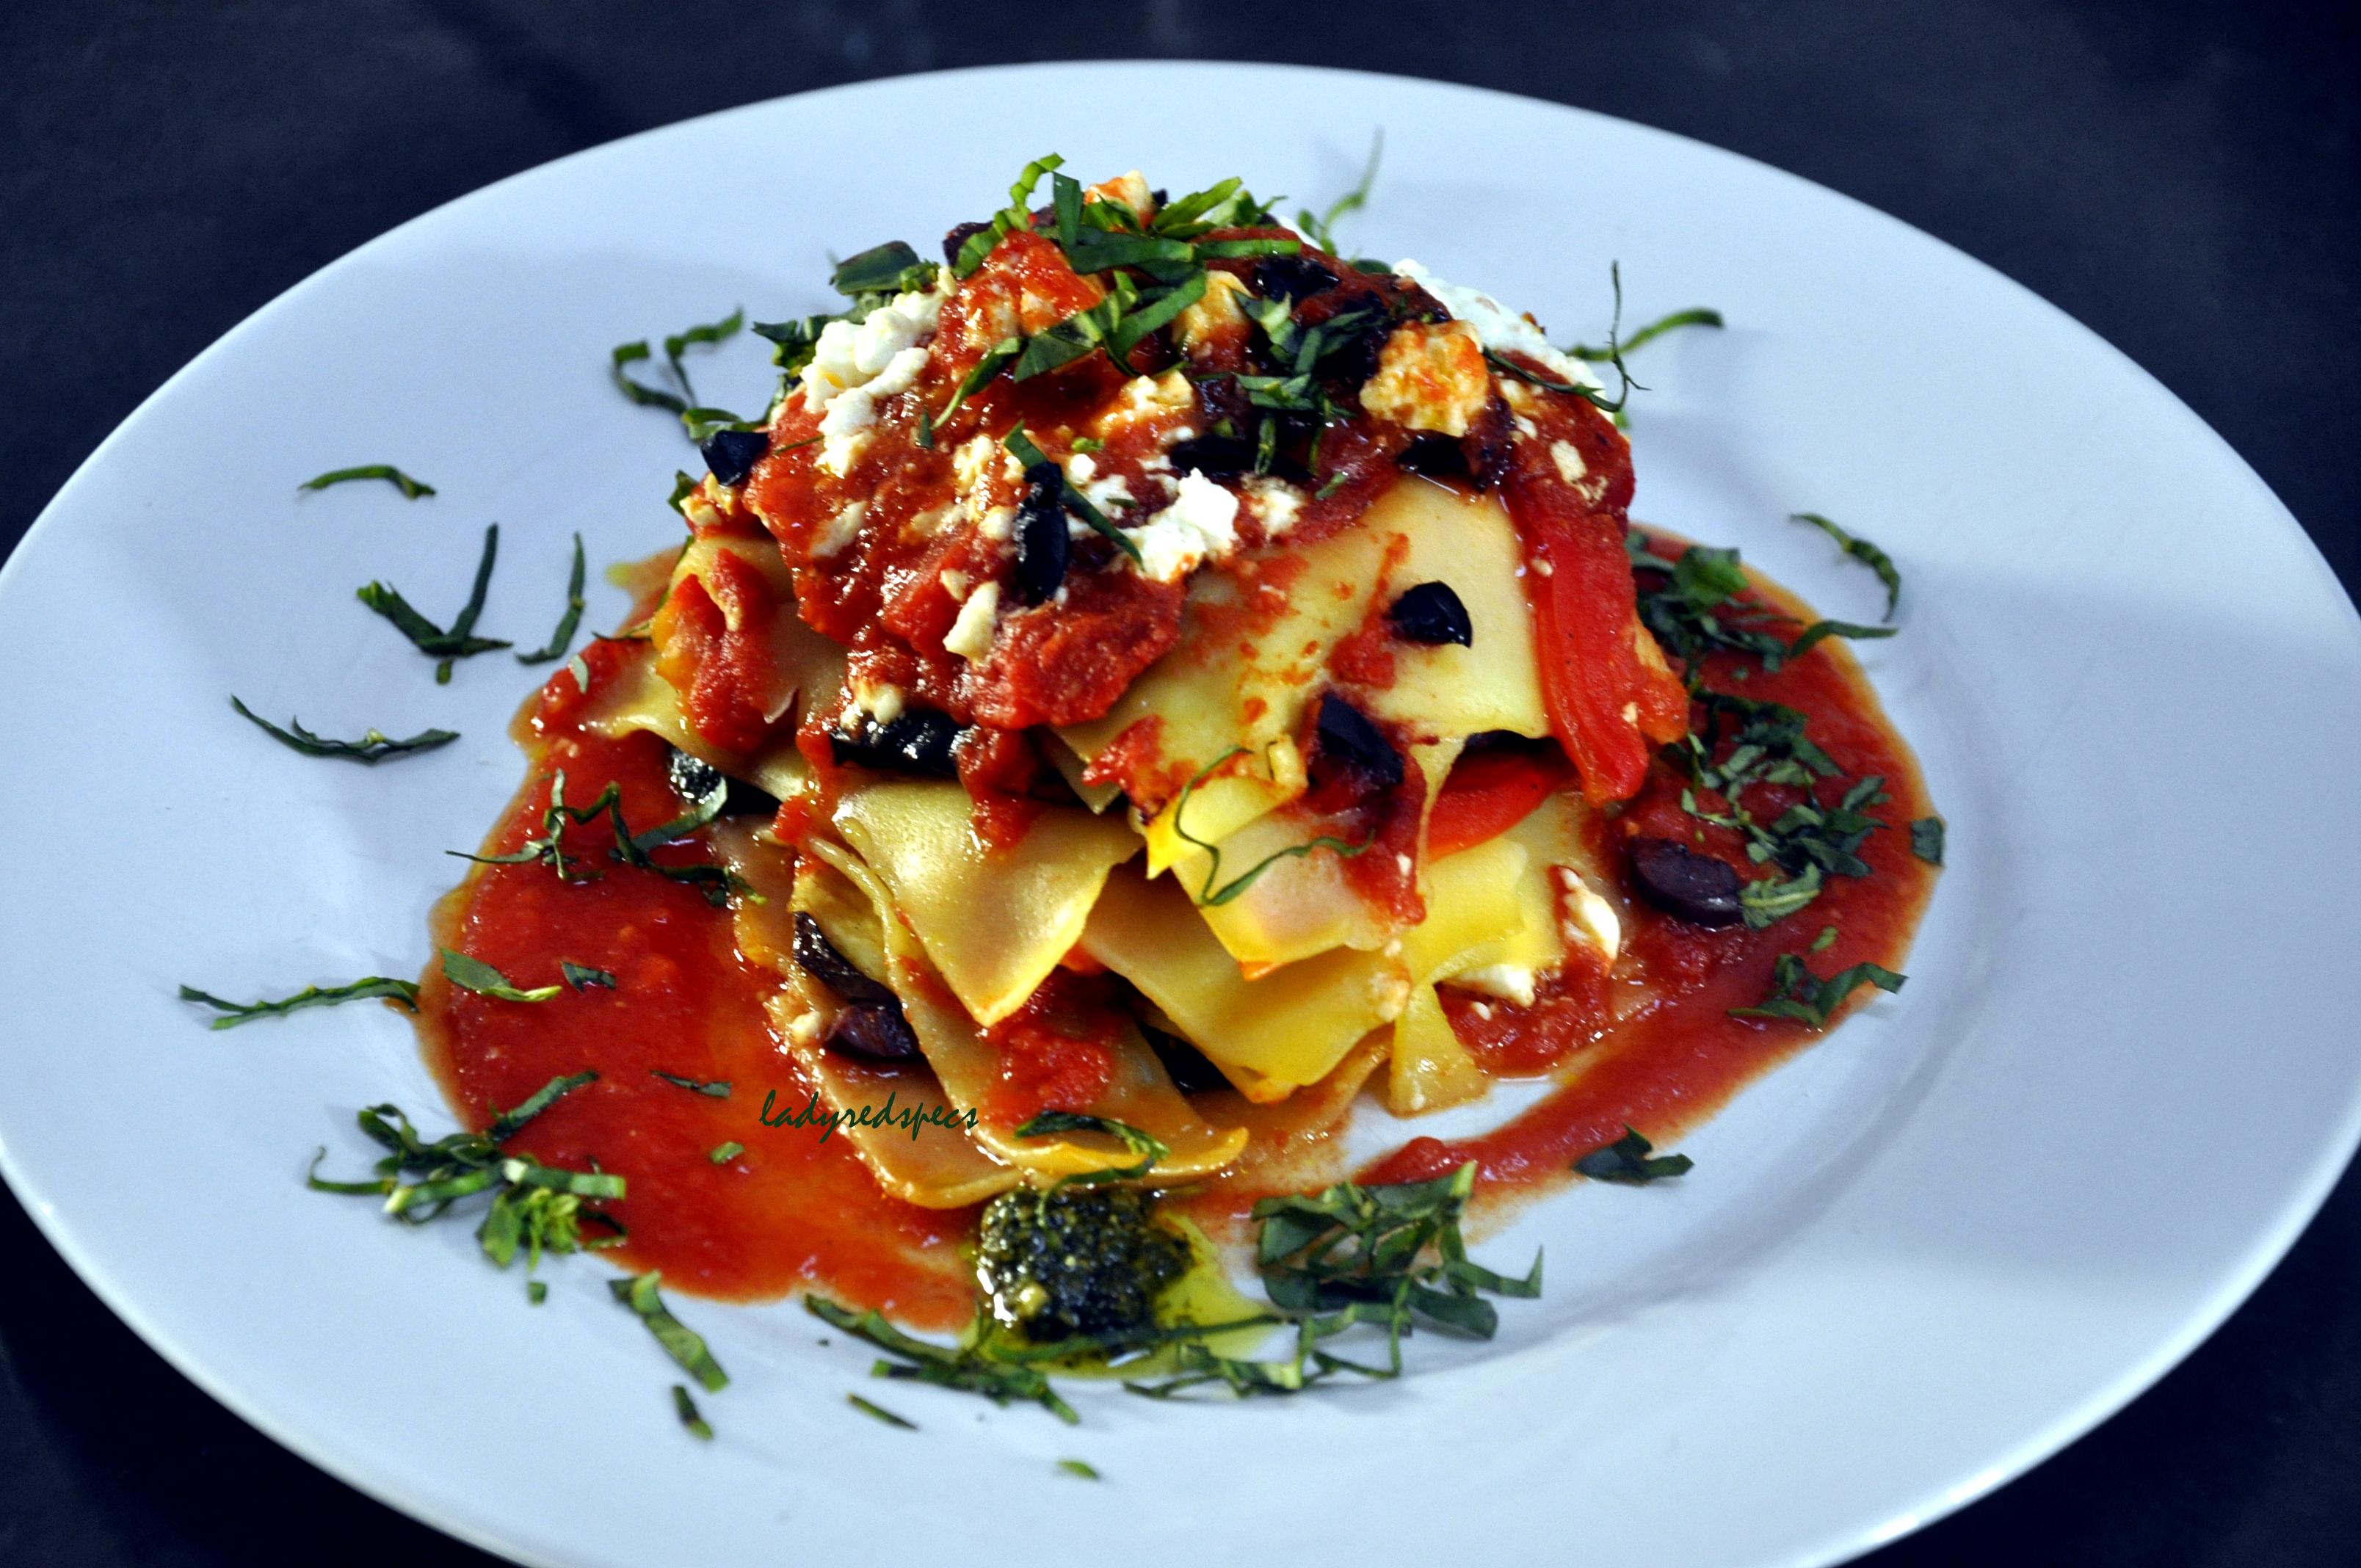 ... deconstructed vegetable deconstructed lasagna recipe deconstructed